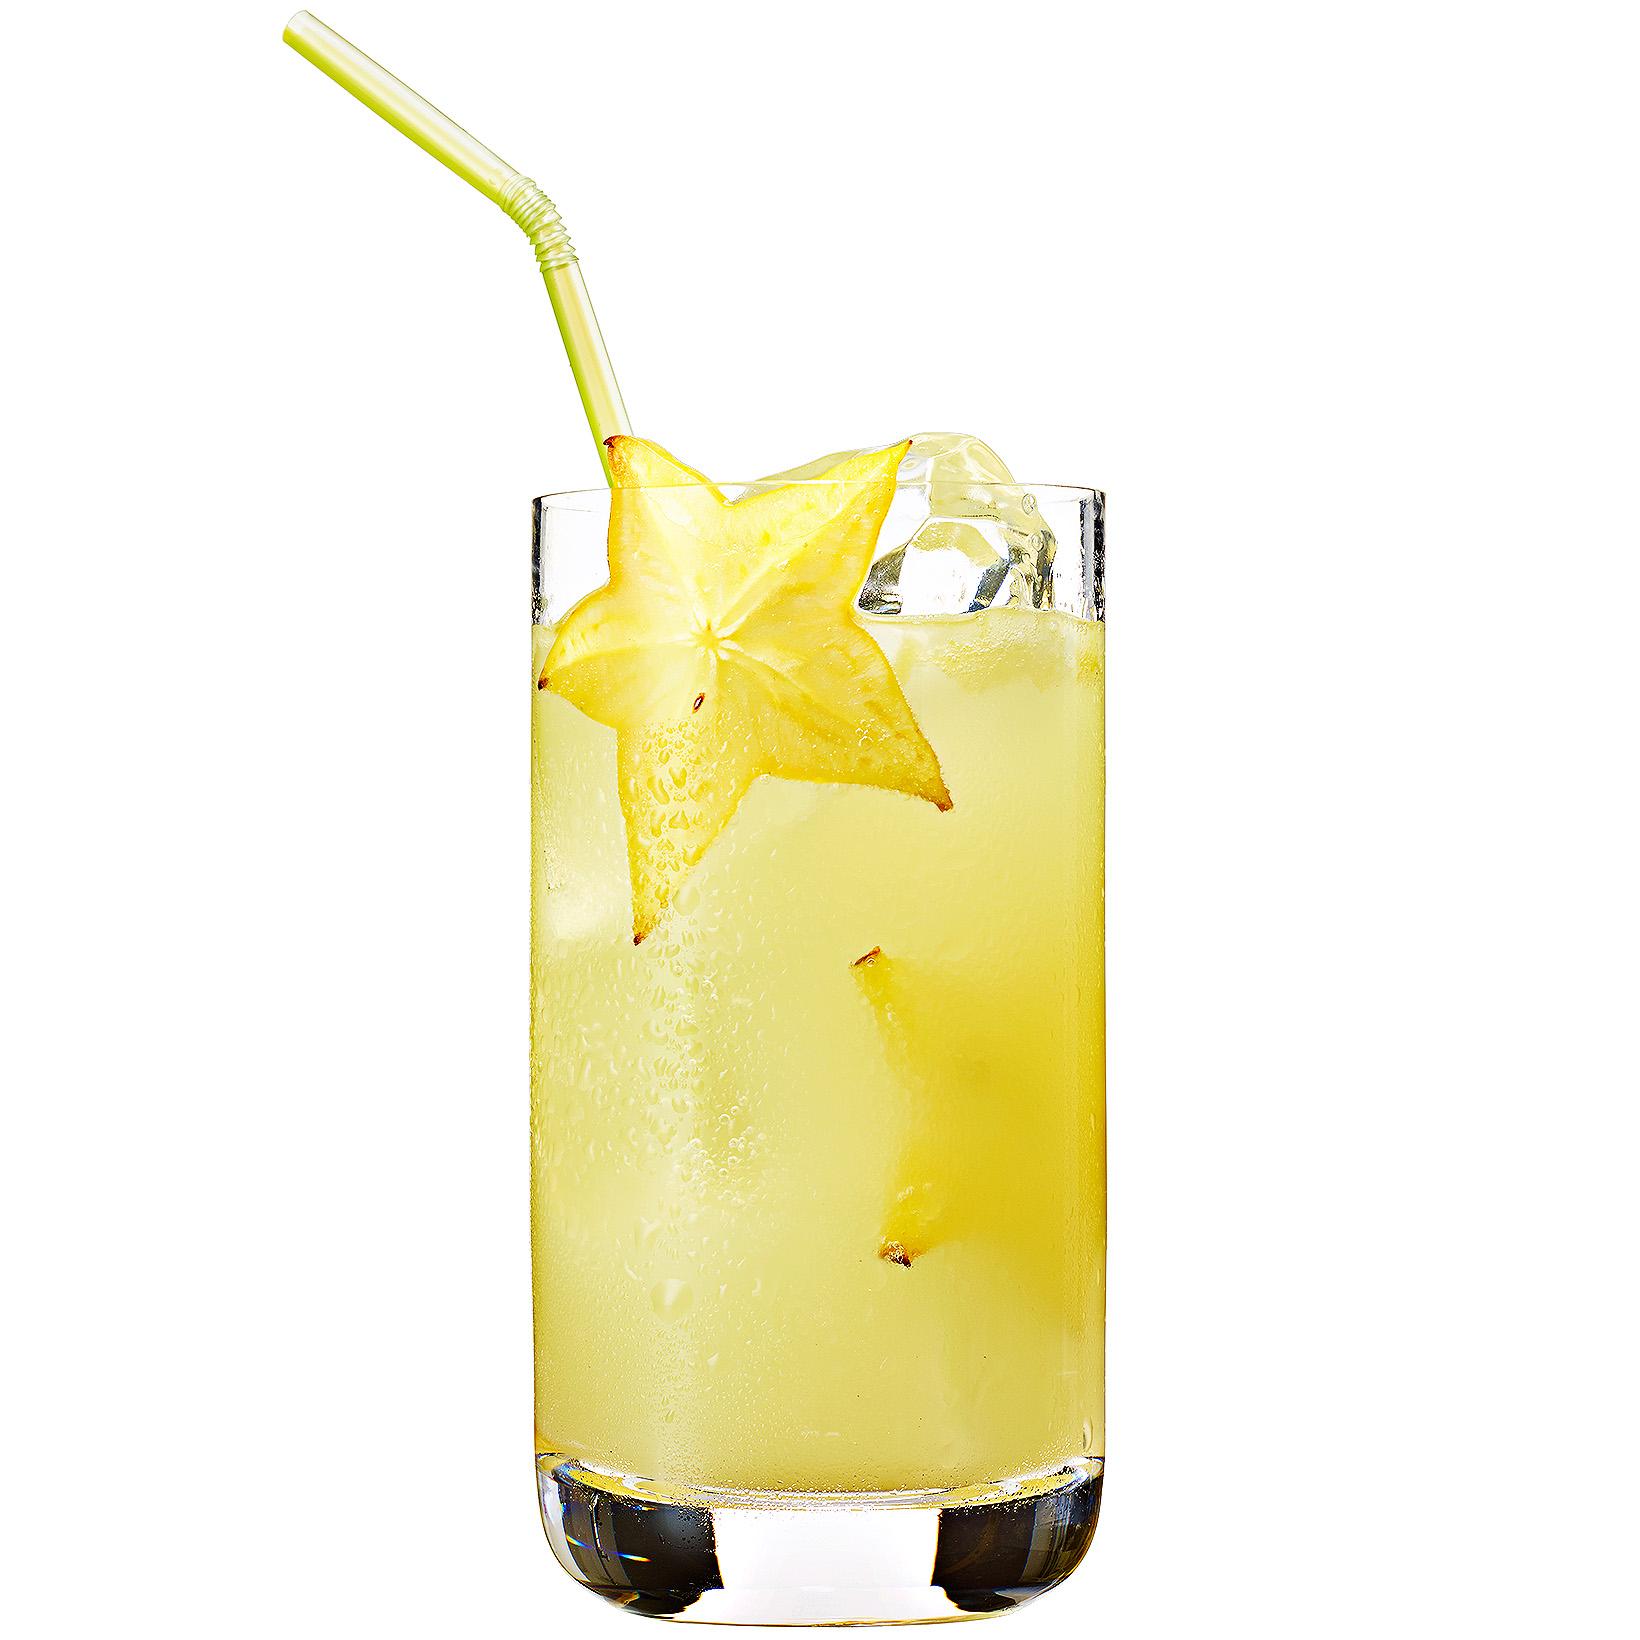 Estrella star fruit cocktail